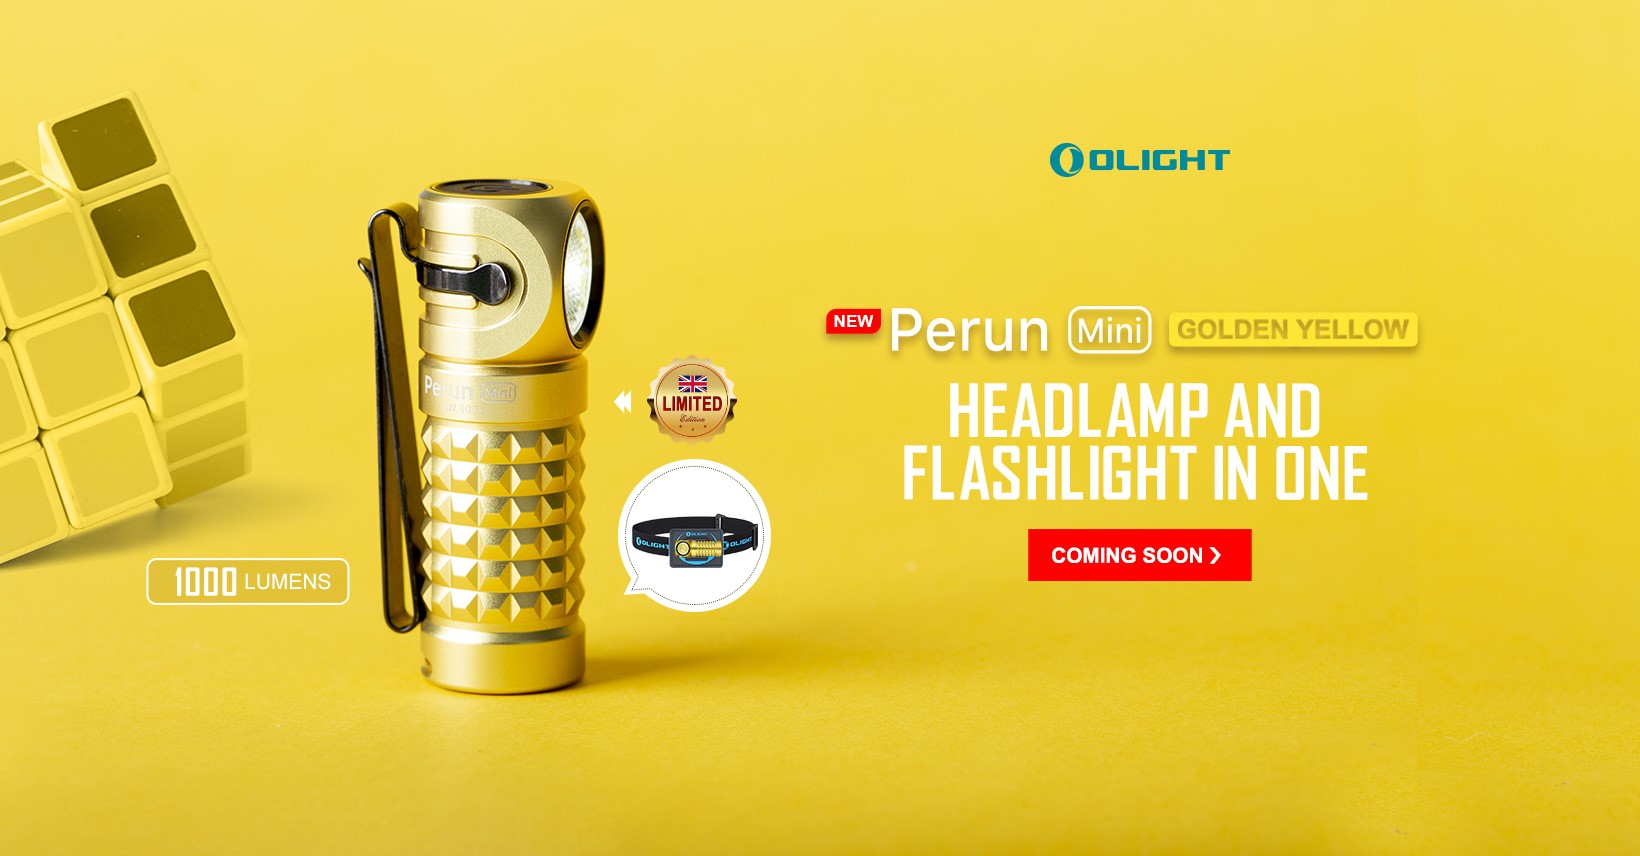 Perun mini kit Golden Yellow